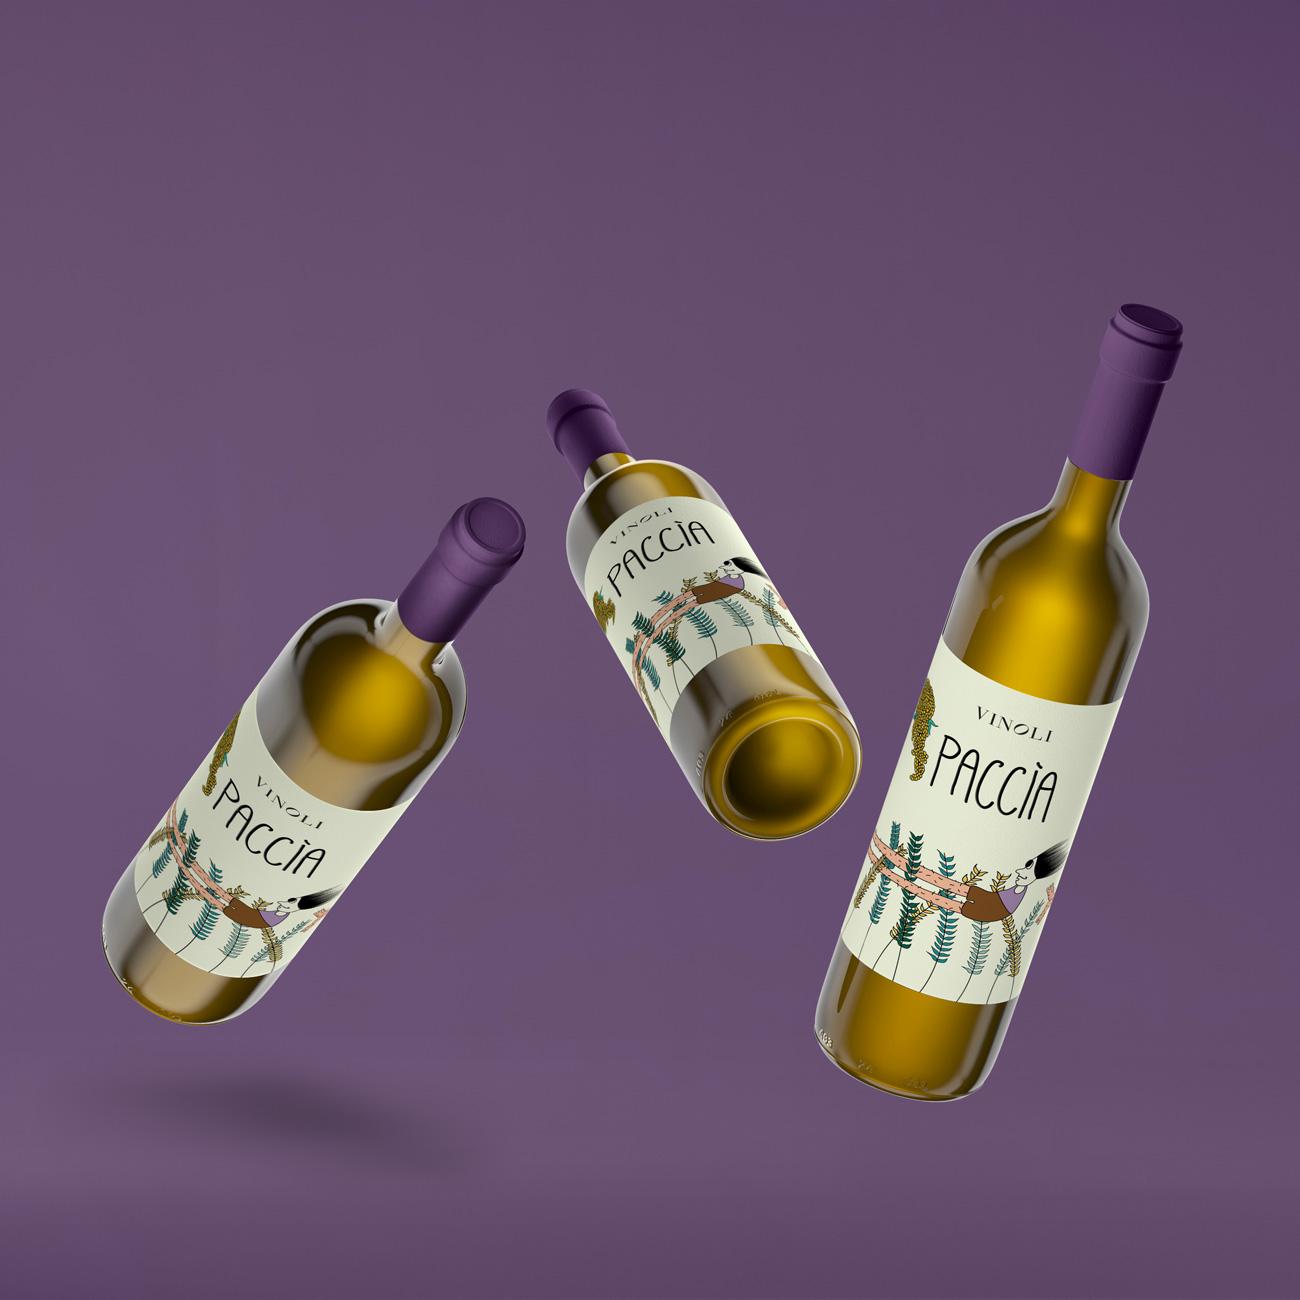 https://www.orlandinifrancesco.com/wp/wp-content/uploads/2019/07/4-Bottiglie-Paccìa.jpg